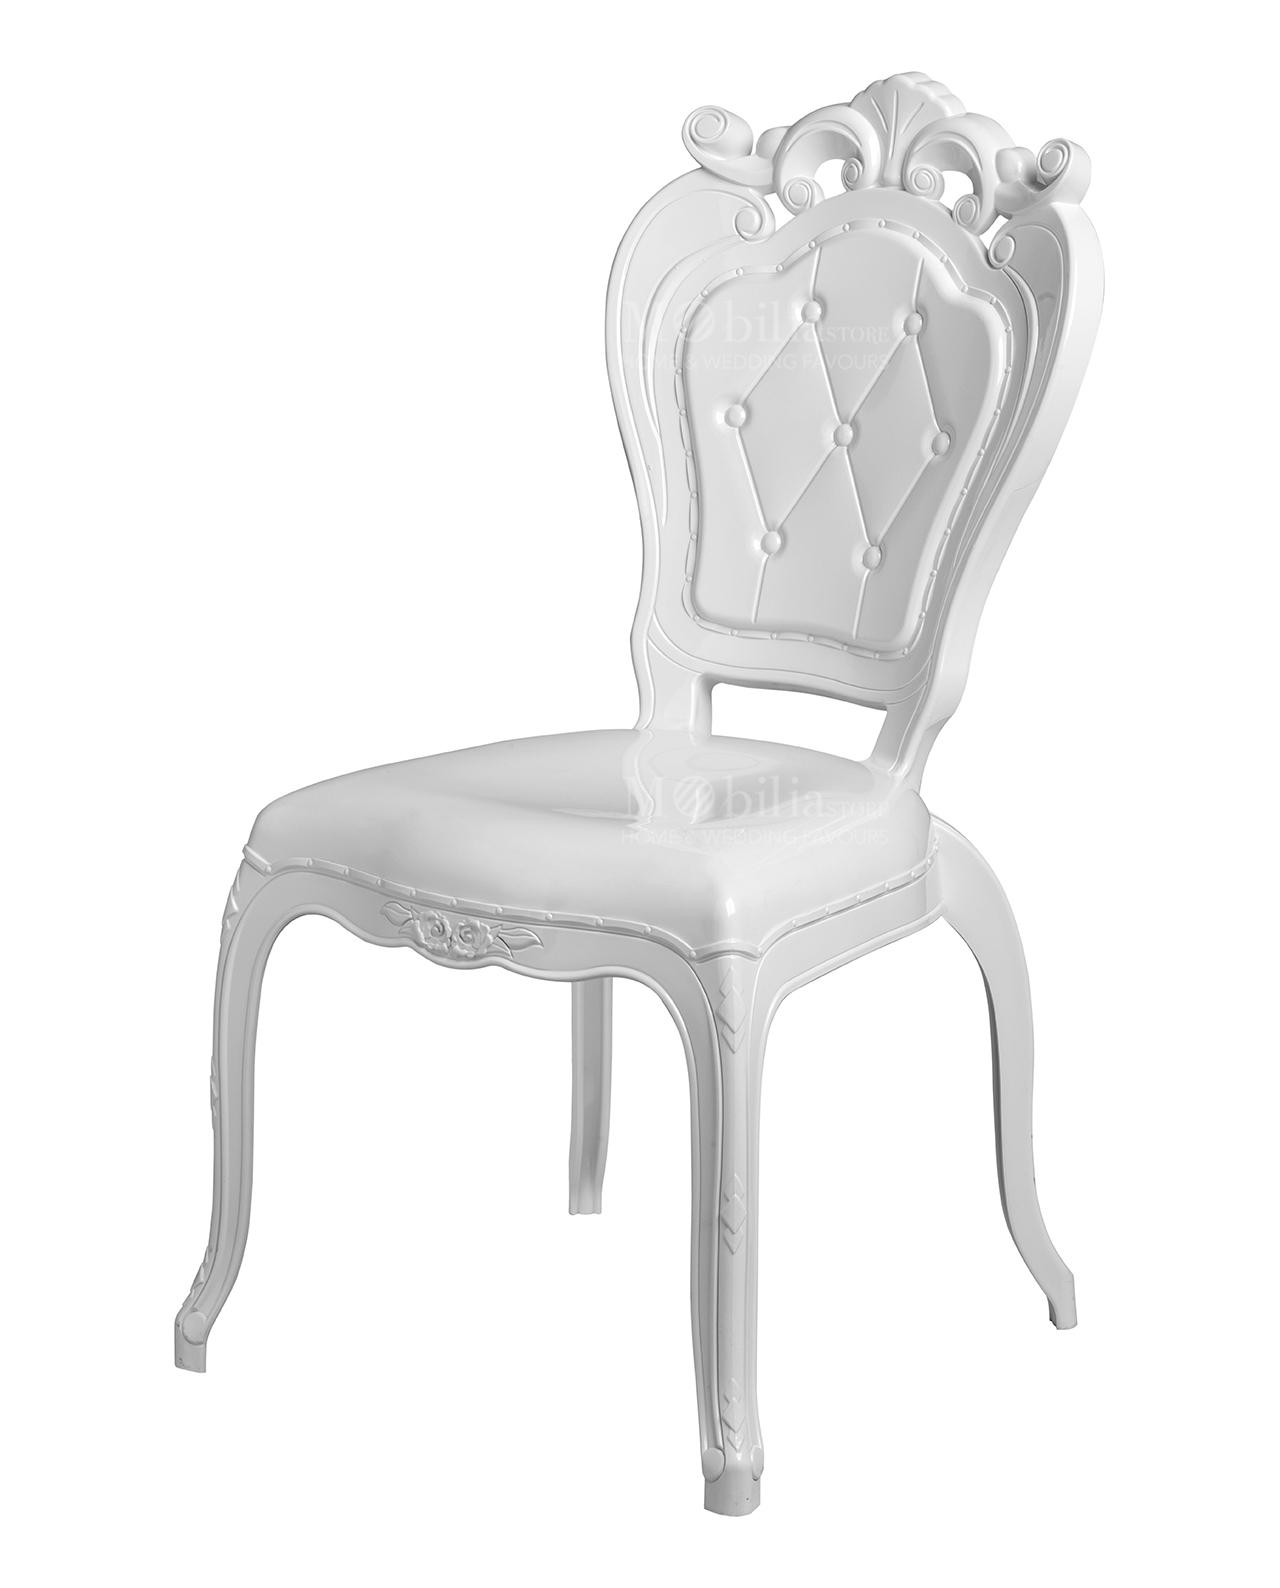 Sedia policarbonato trapuntina bianca brandani mobilia for Mobilia outlet